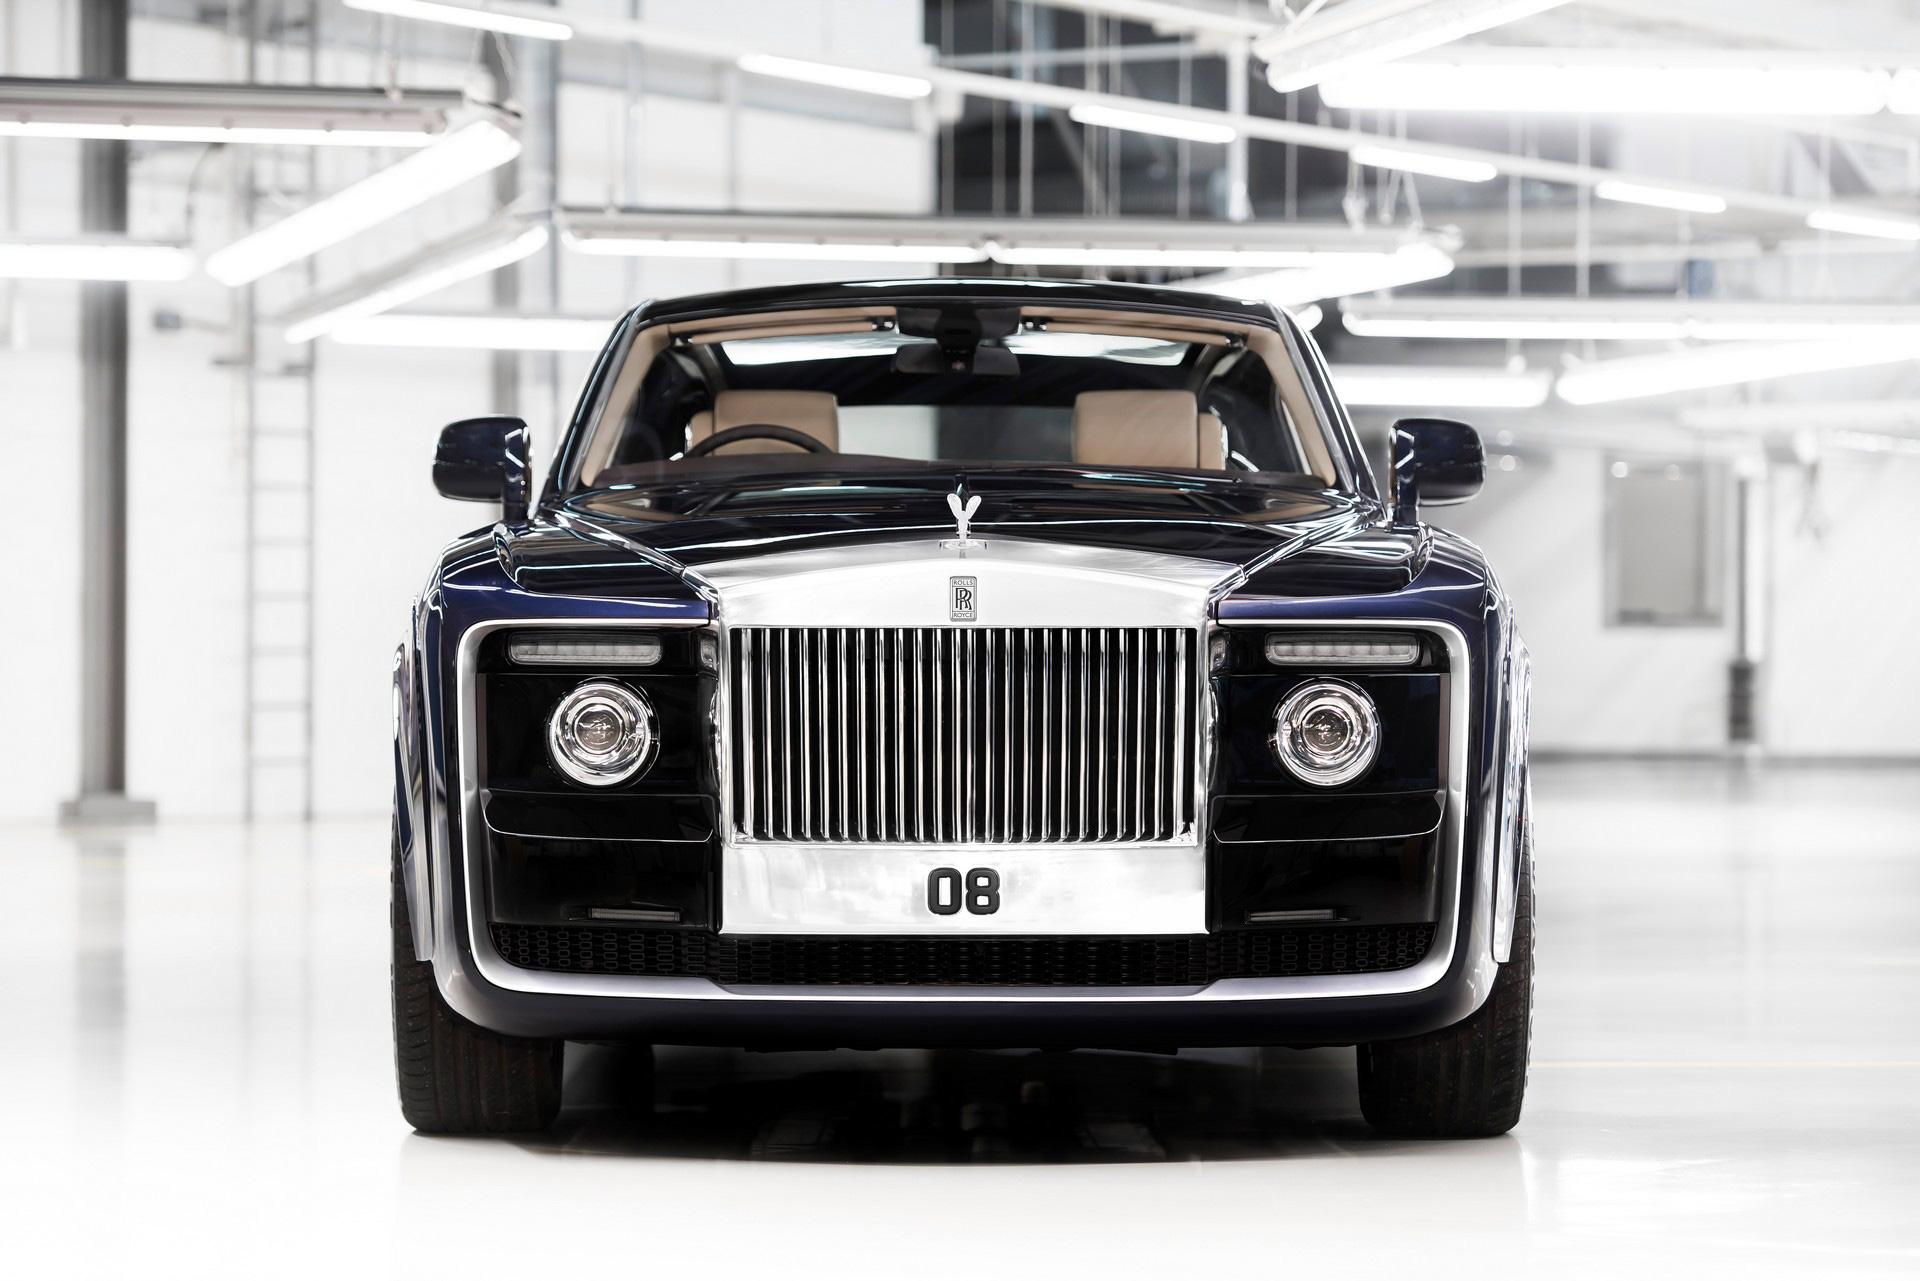 CoachBuild Rolls-Royce (18).JPG